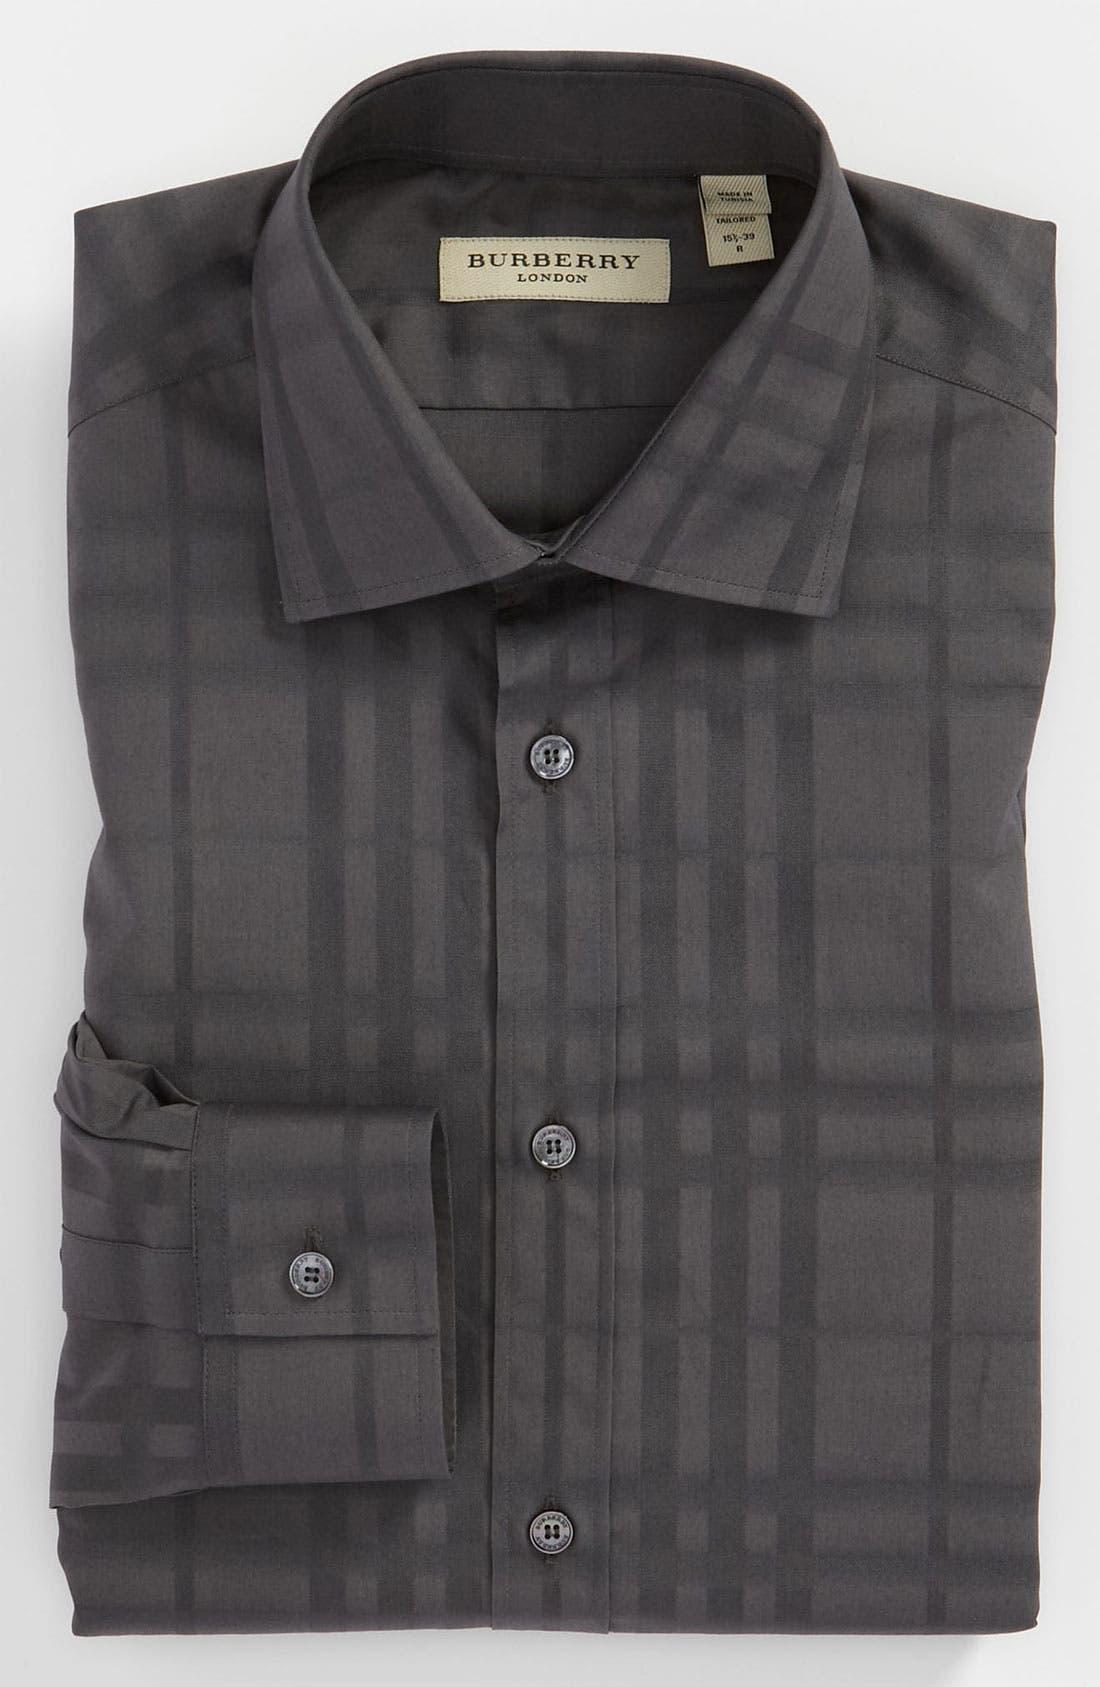 Alternate Image 1 Selected - Burberry London Trim Fit Dress Shirt